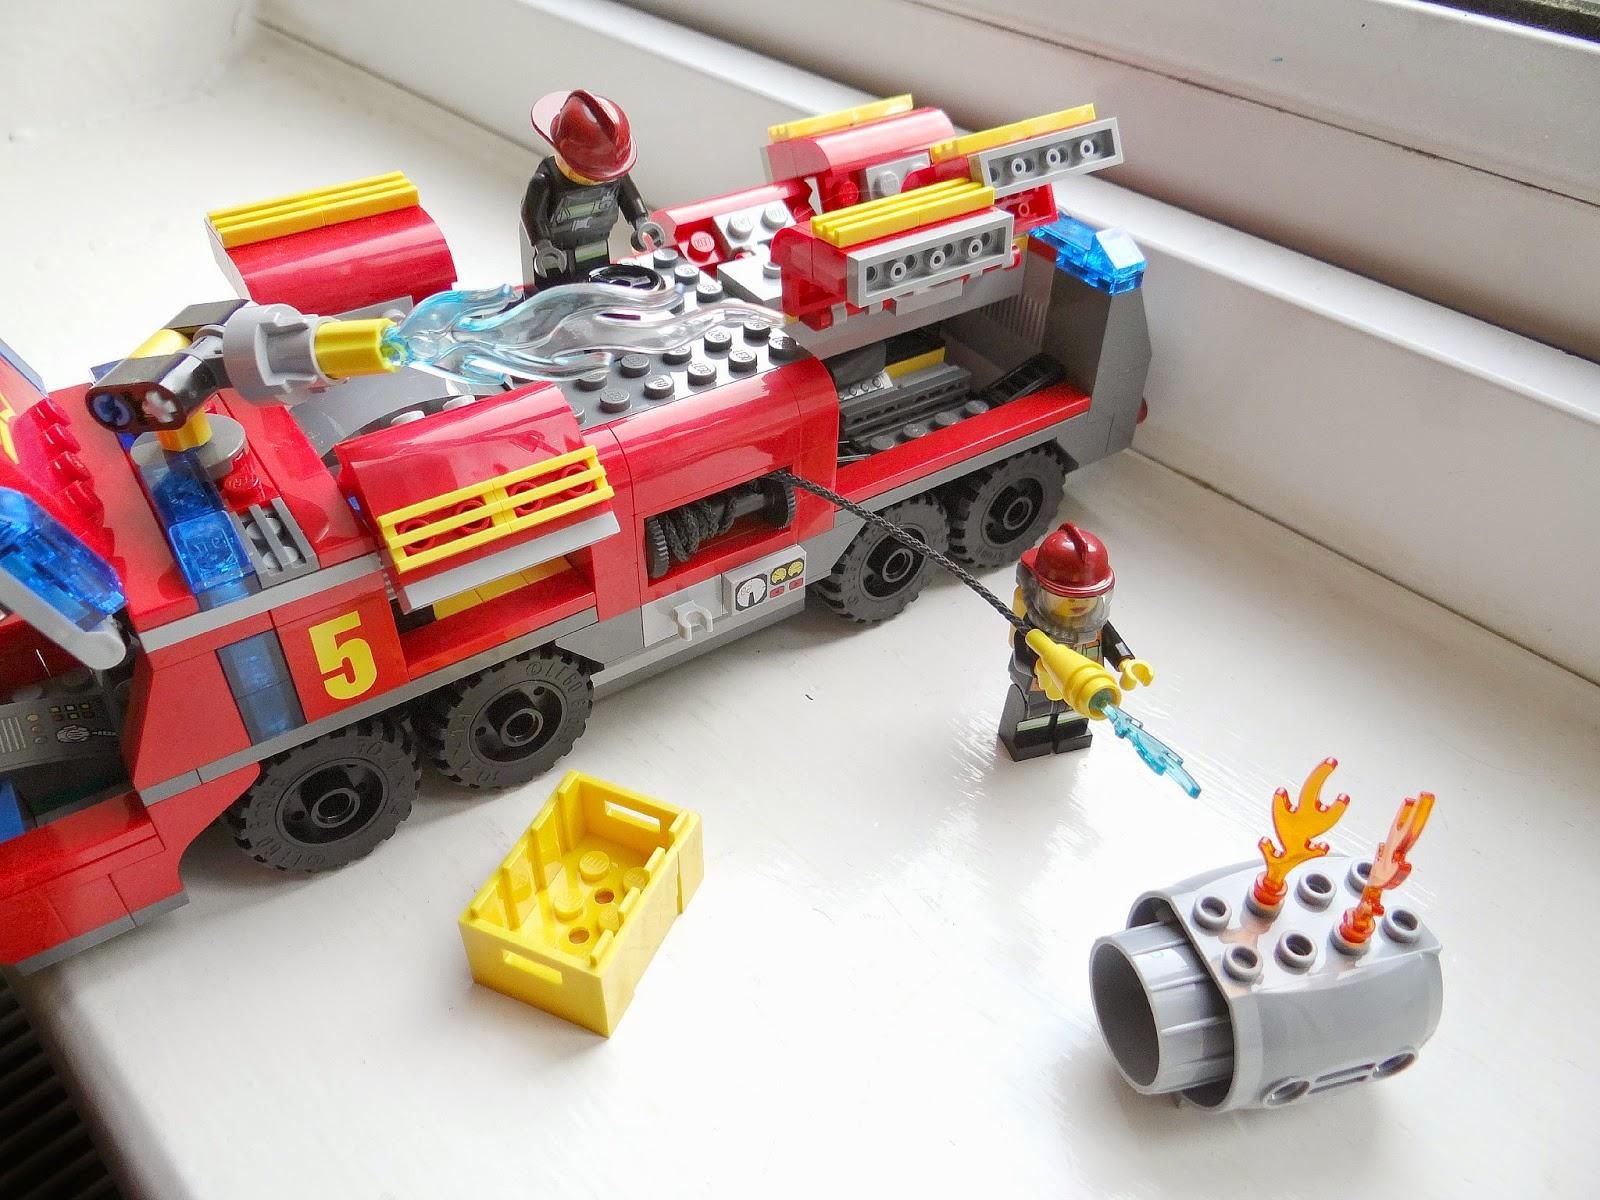 LEGO City, LEGO Disney Princess, LEGO Mixels